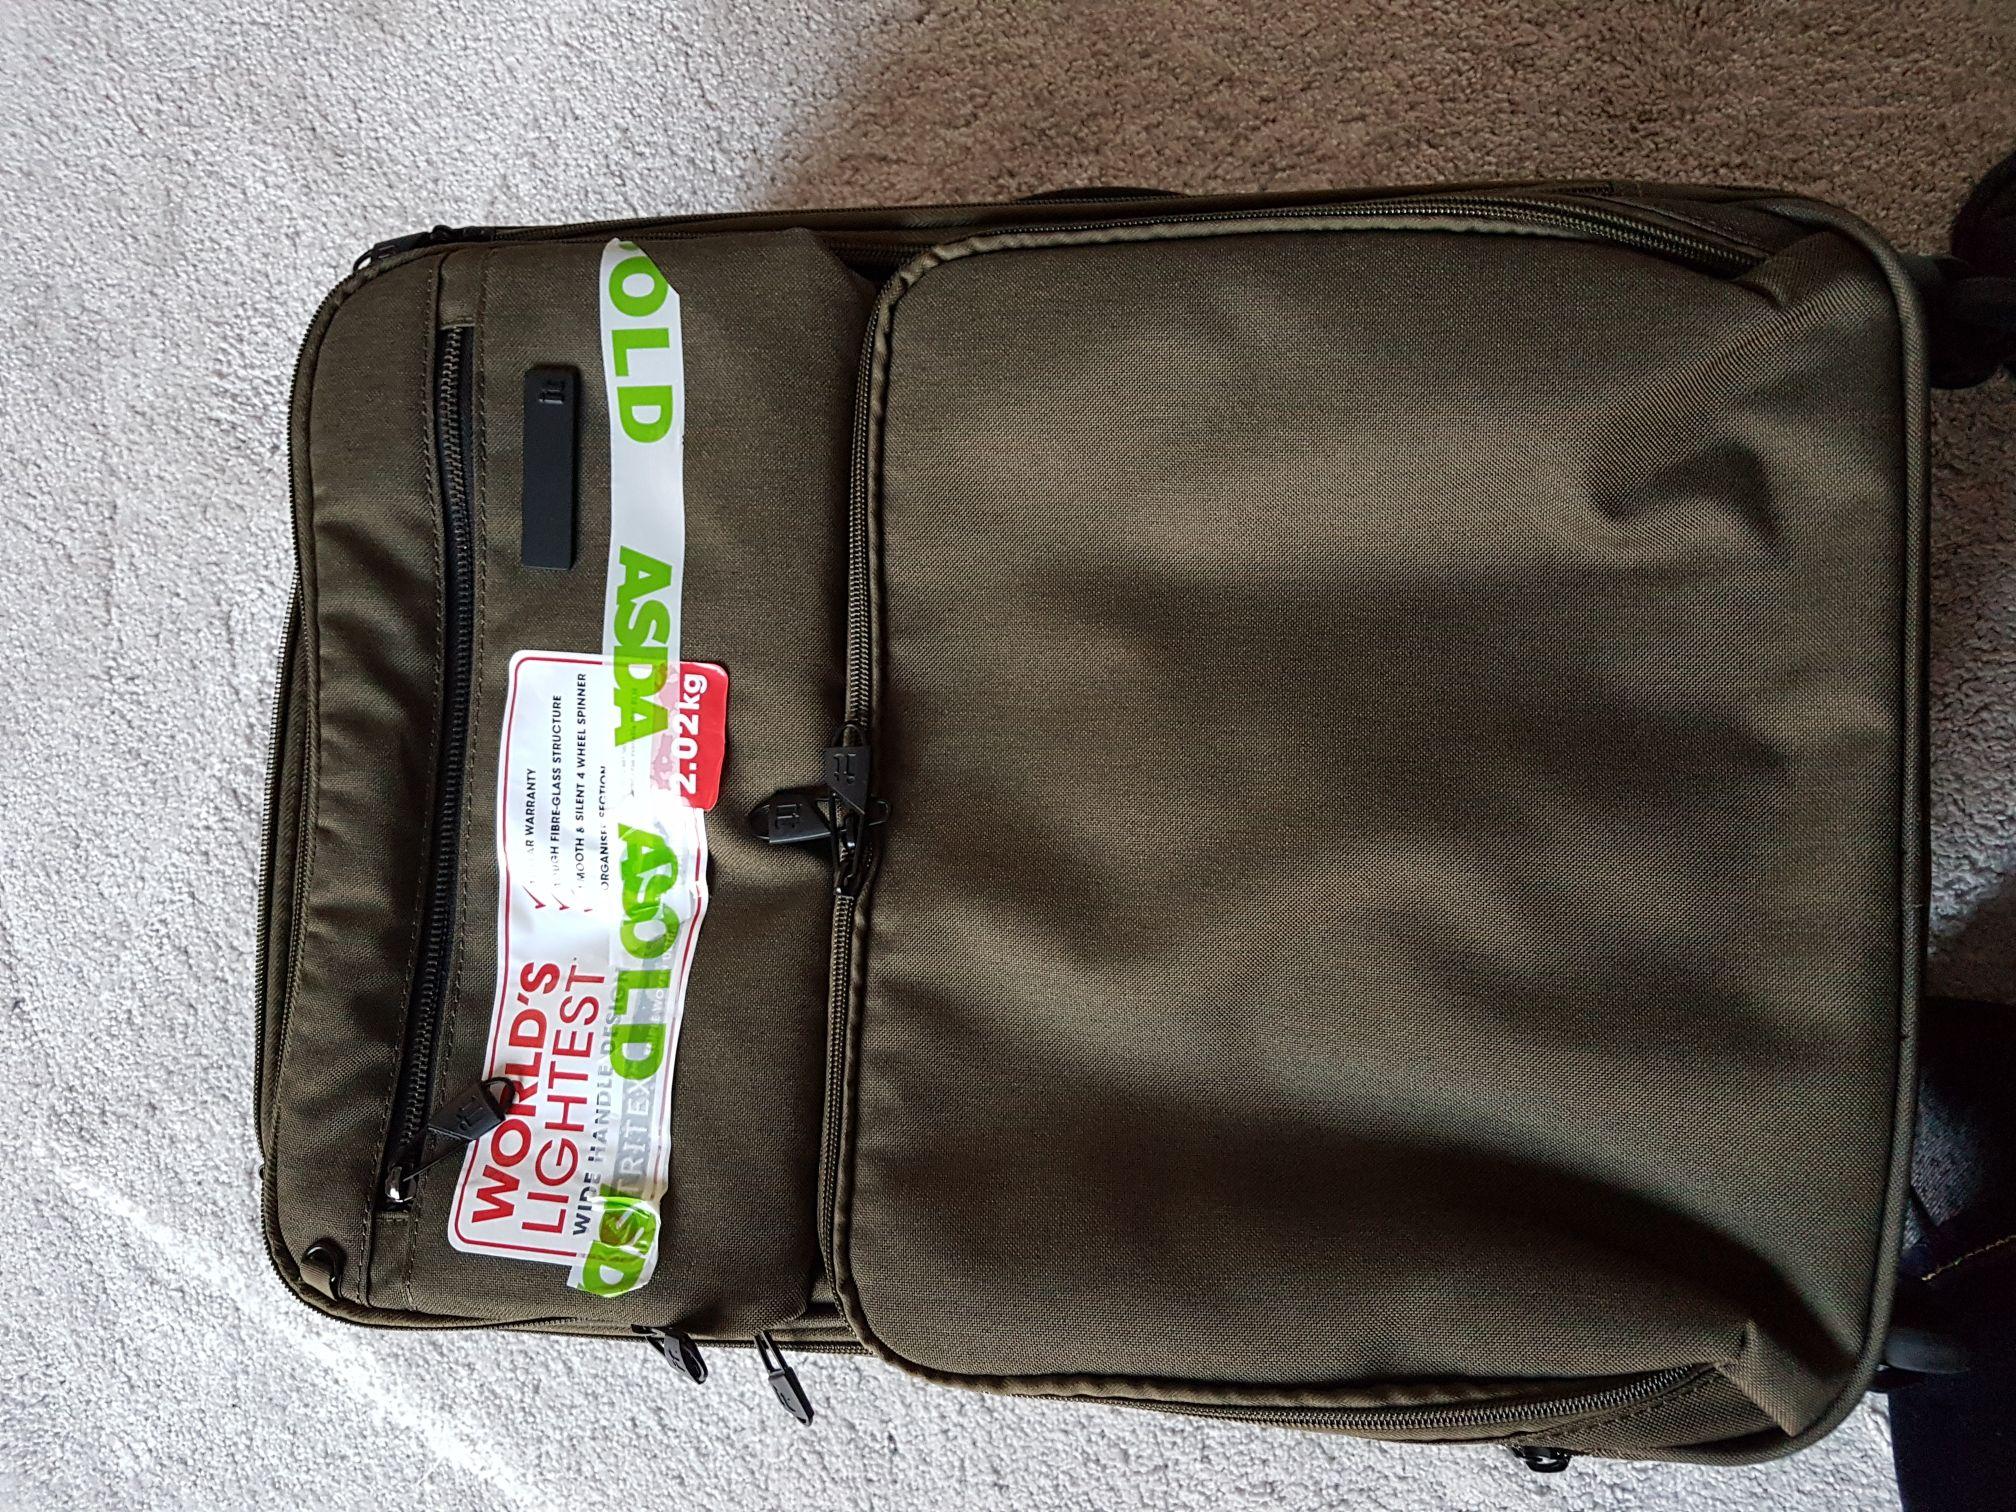 Cabin suitcase - £17 instore @ Asda